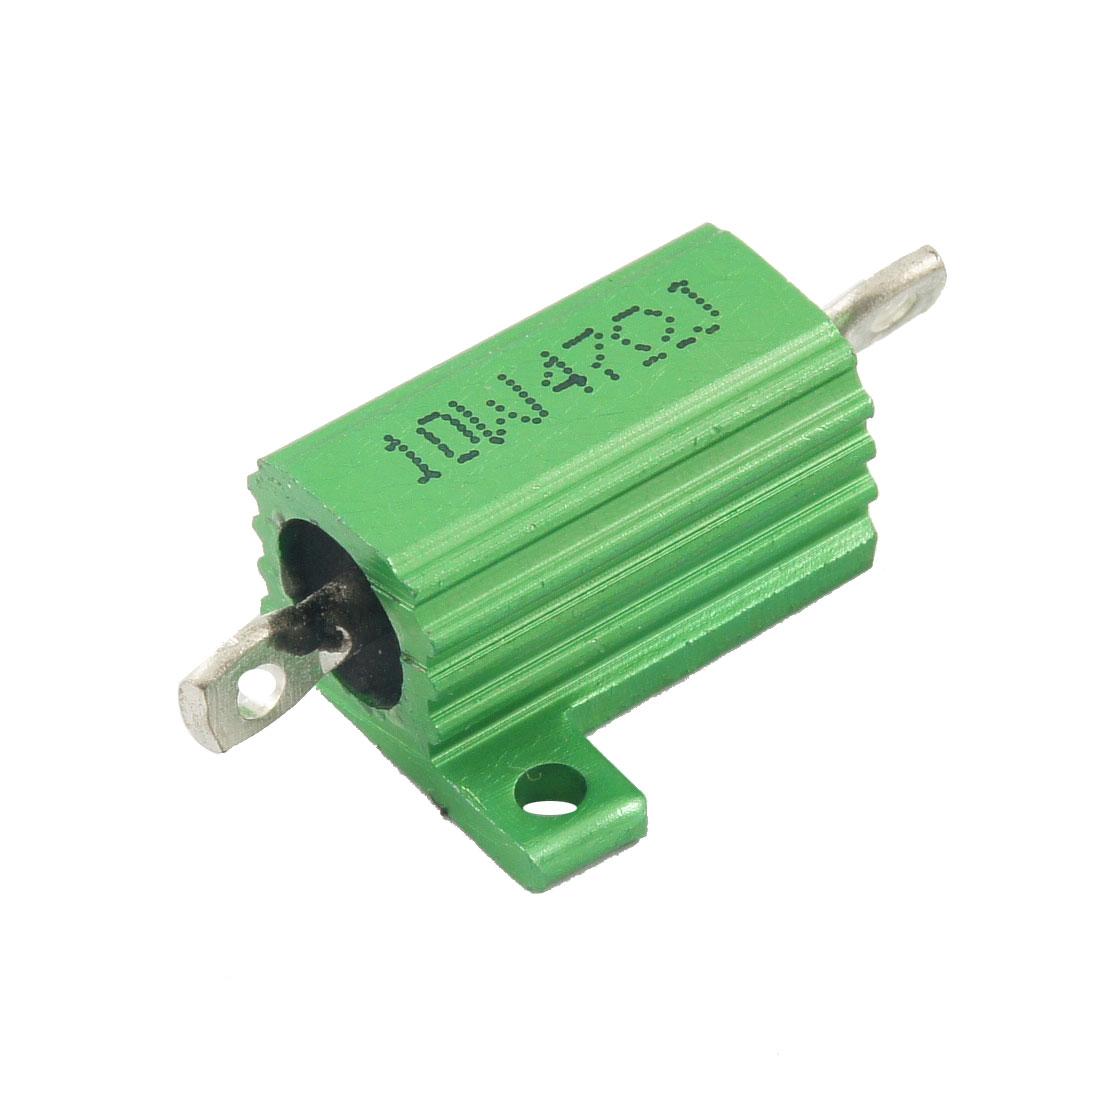 Green 10 Watt 47 Ohm 5% Tolerance Aluminum Shell Wire Wound Resistor